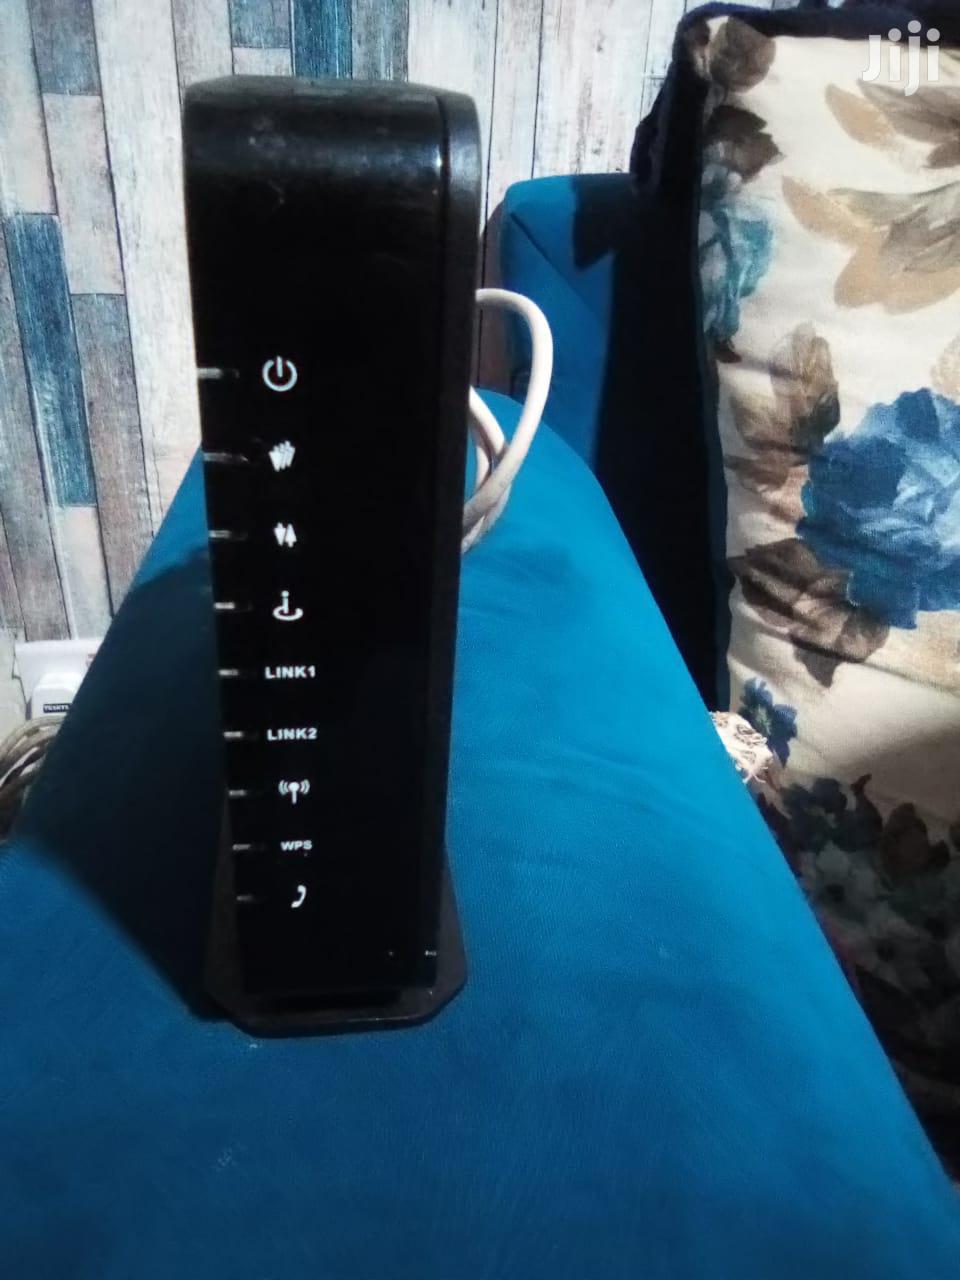 Archive Zuku Decoder Router In Umoja I Networking Products Erick Imaya Jiji Co Ke